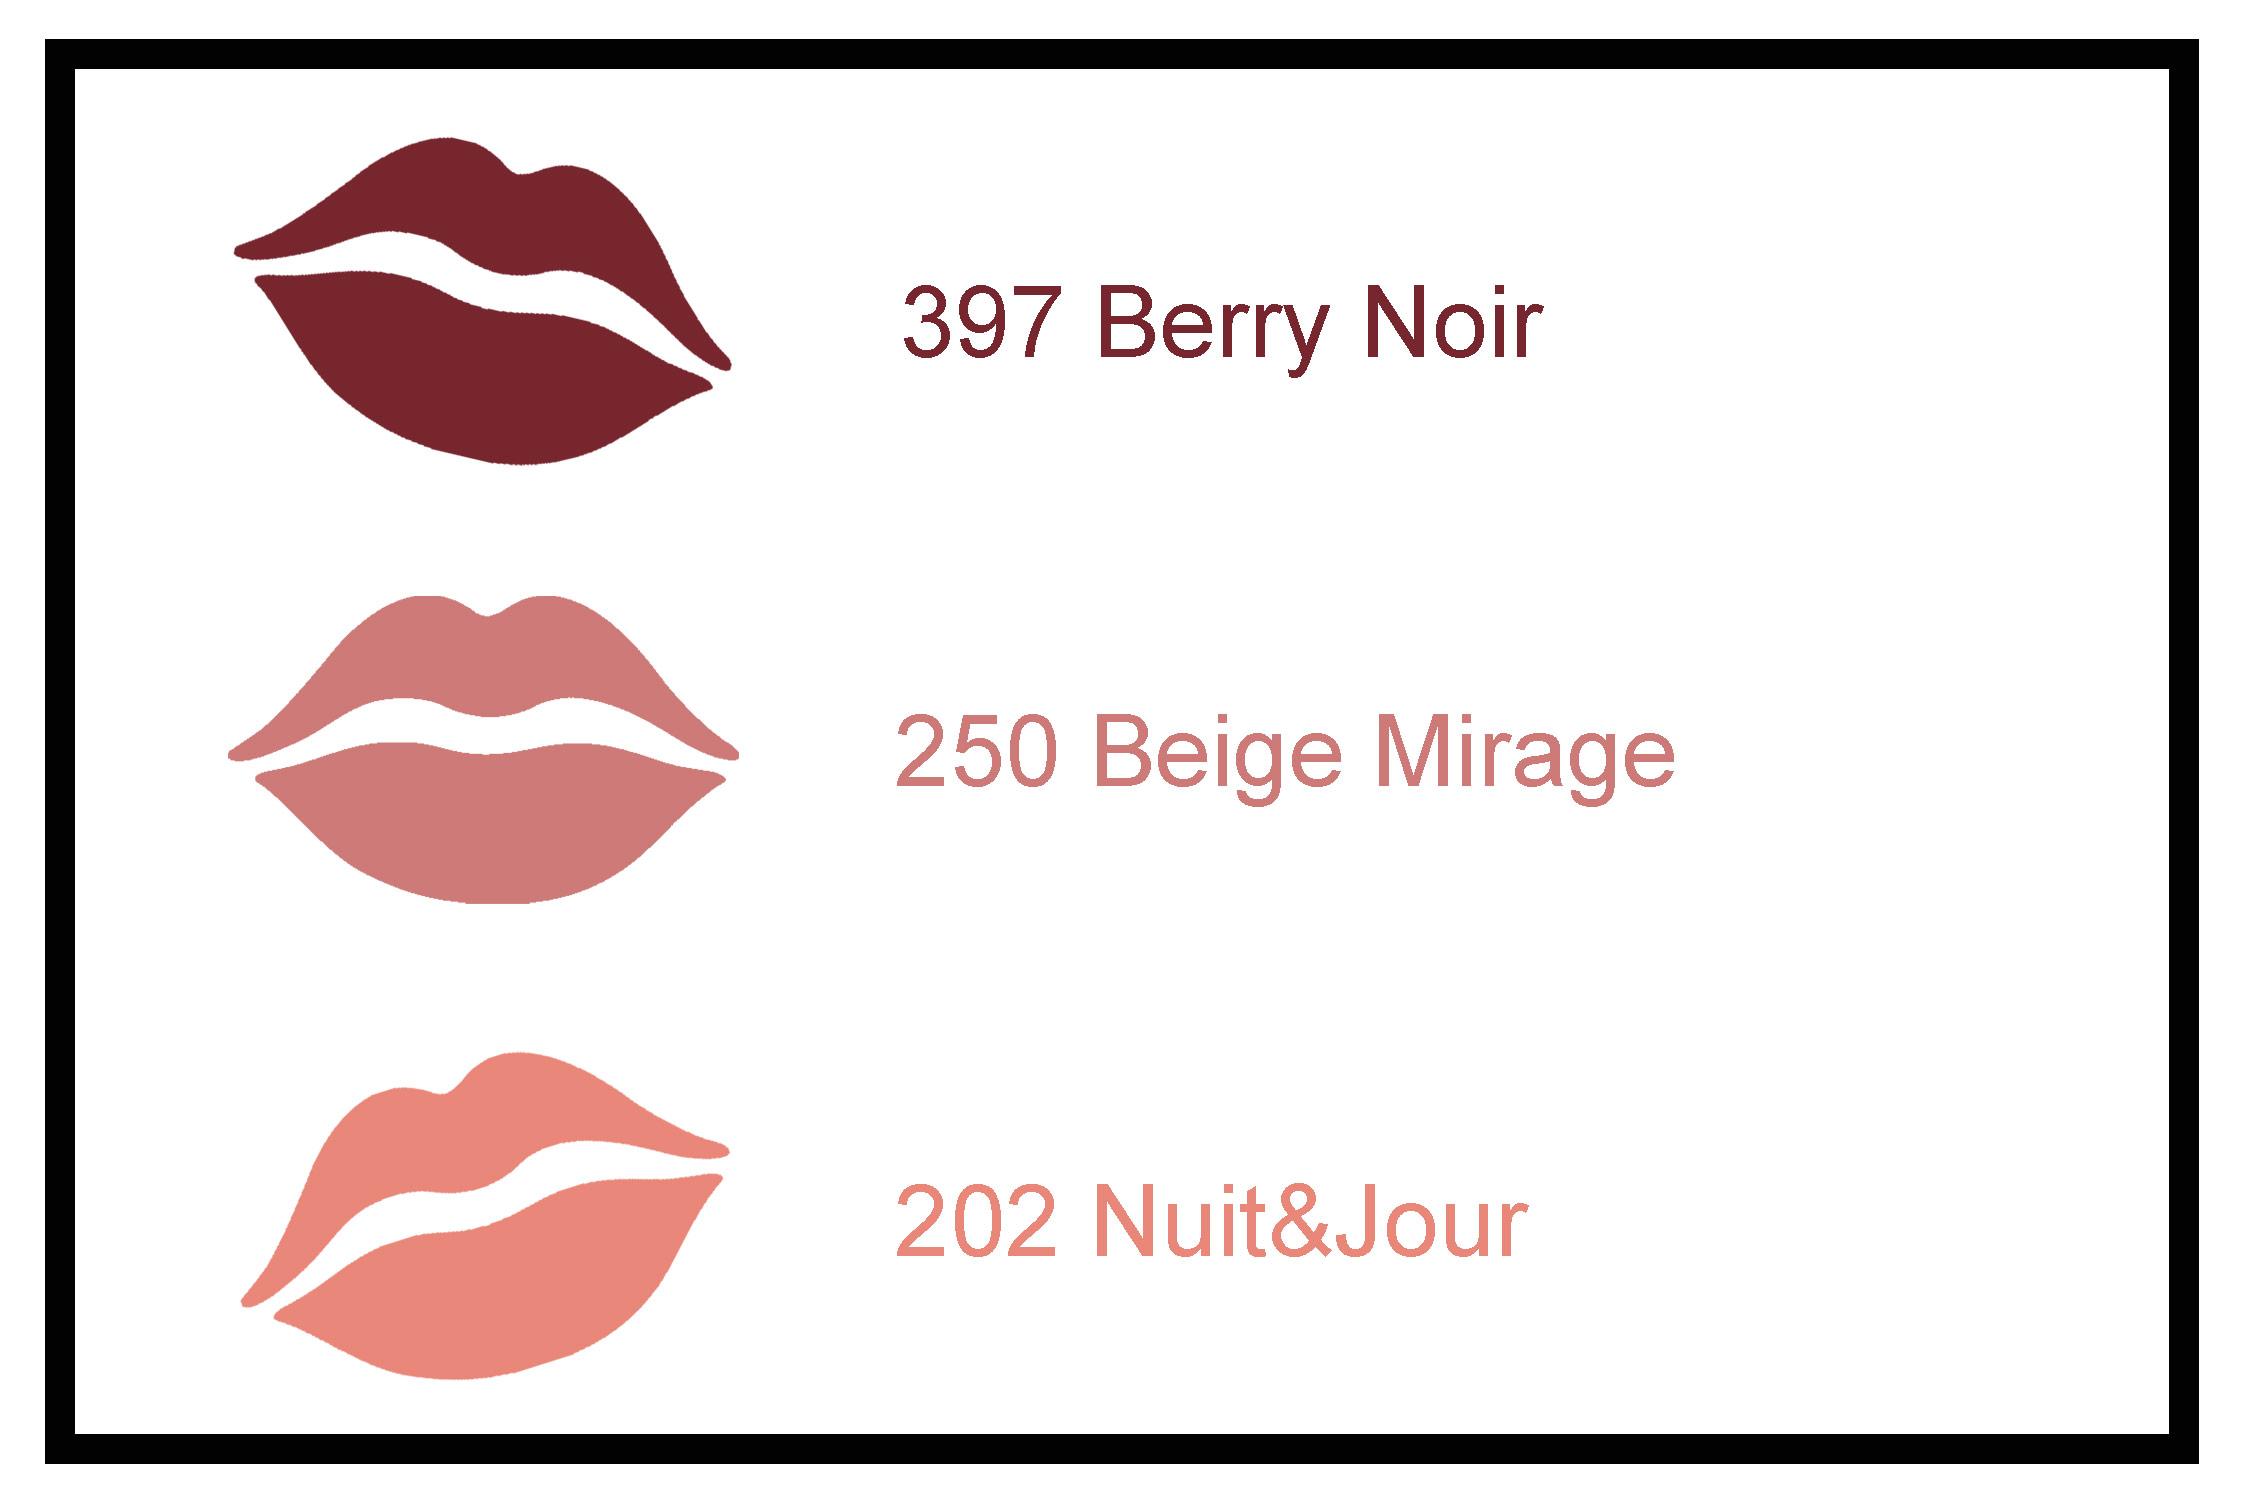 Lippenstift Farben